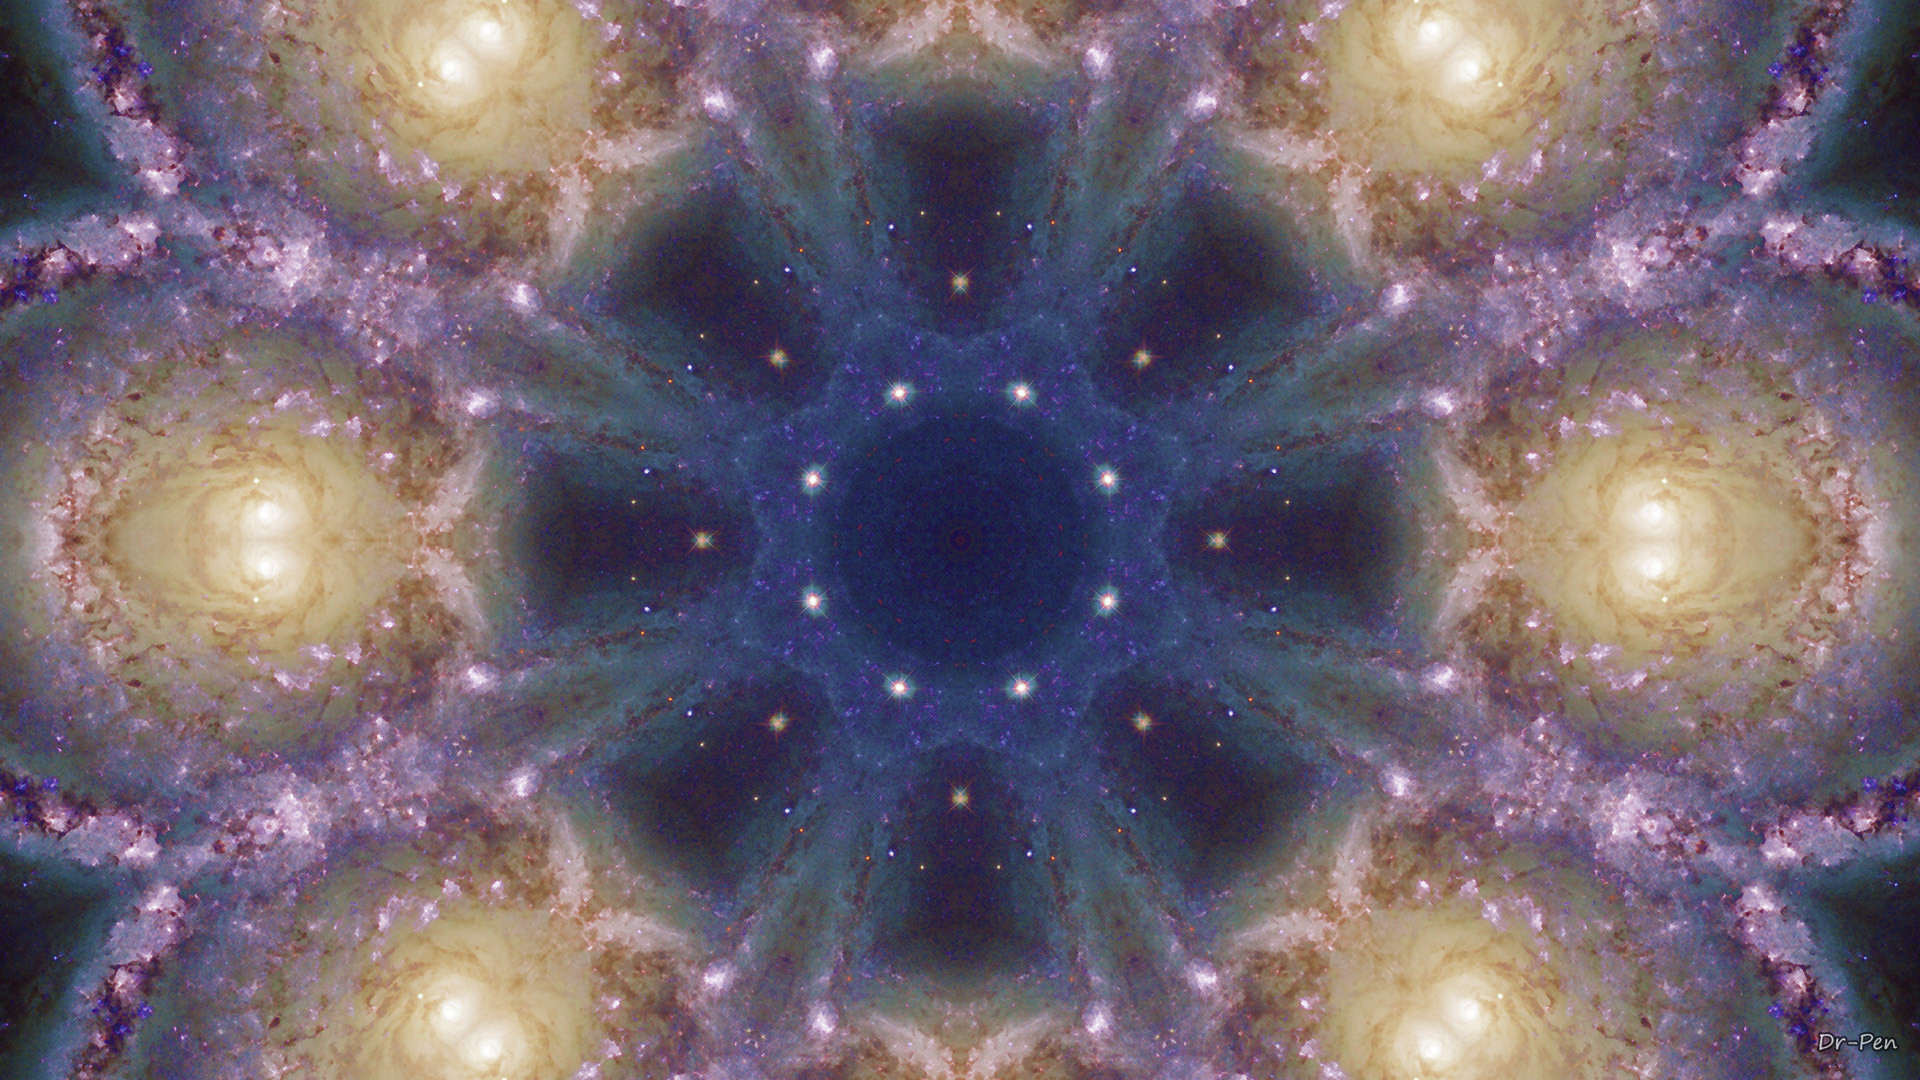 Abstract – Pattern Abstract Artistic Digital Mandala Manipulation Space  Wallpaper